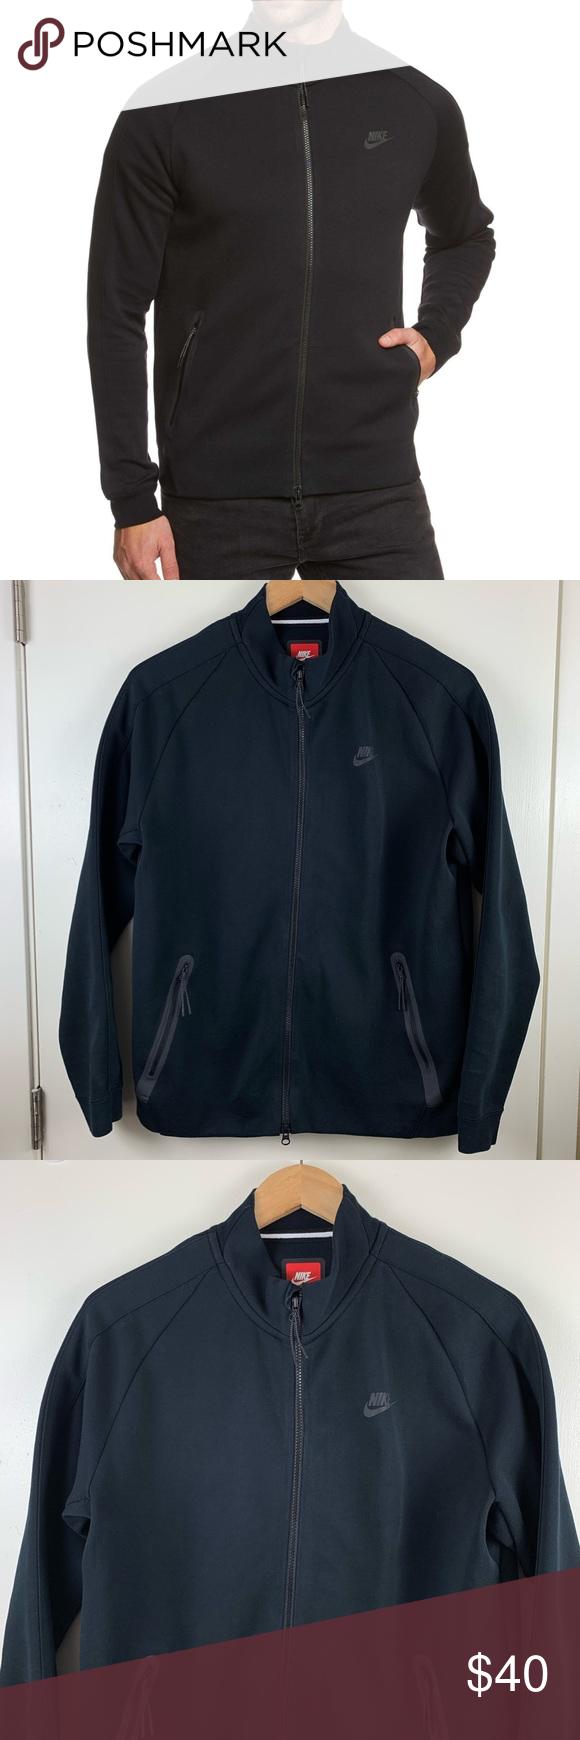 Nike F.C Tech Fleece N98 Black Full Zip sweatshirt Preowned